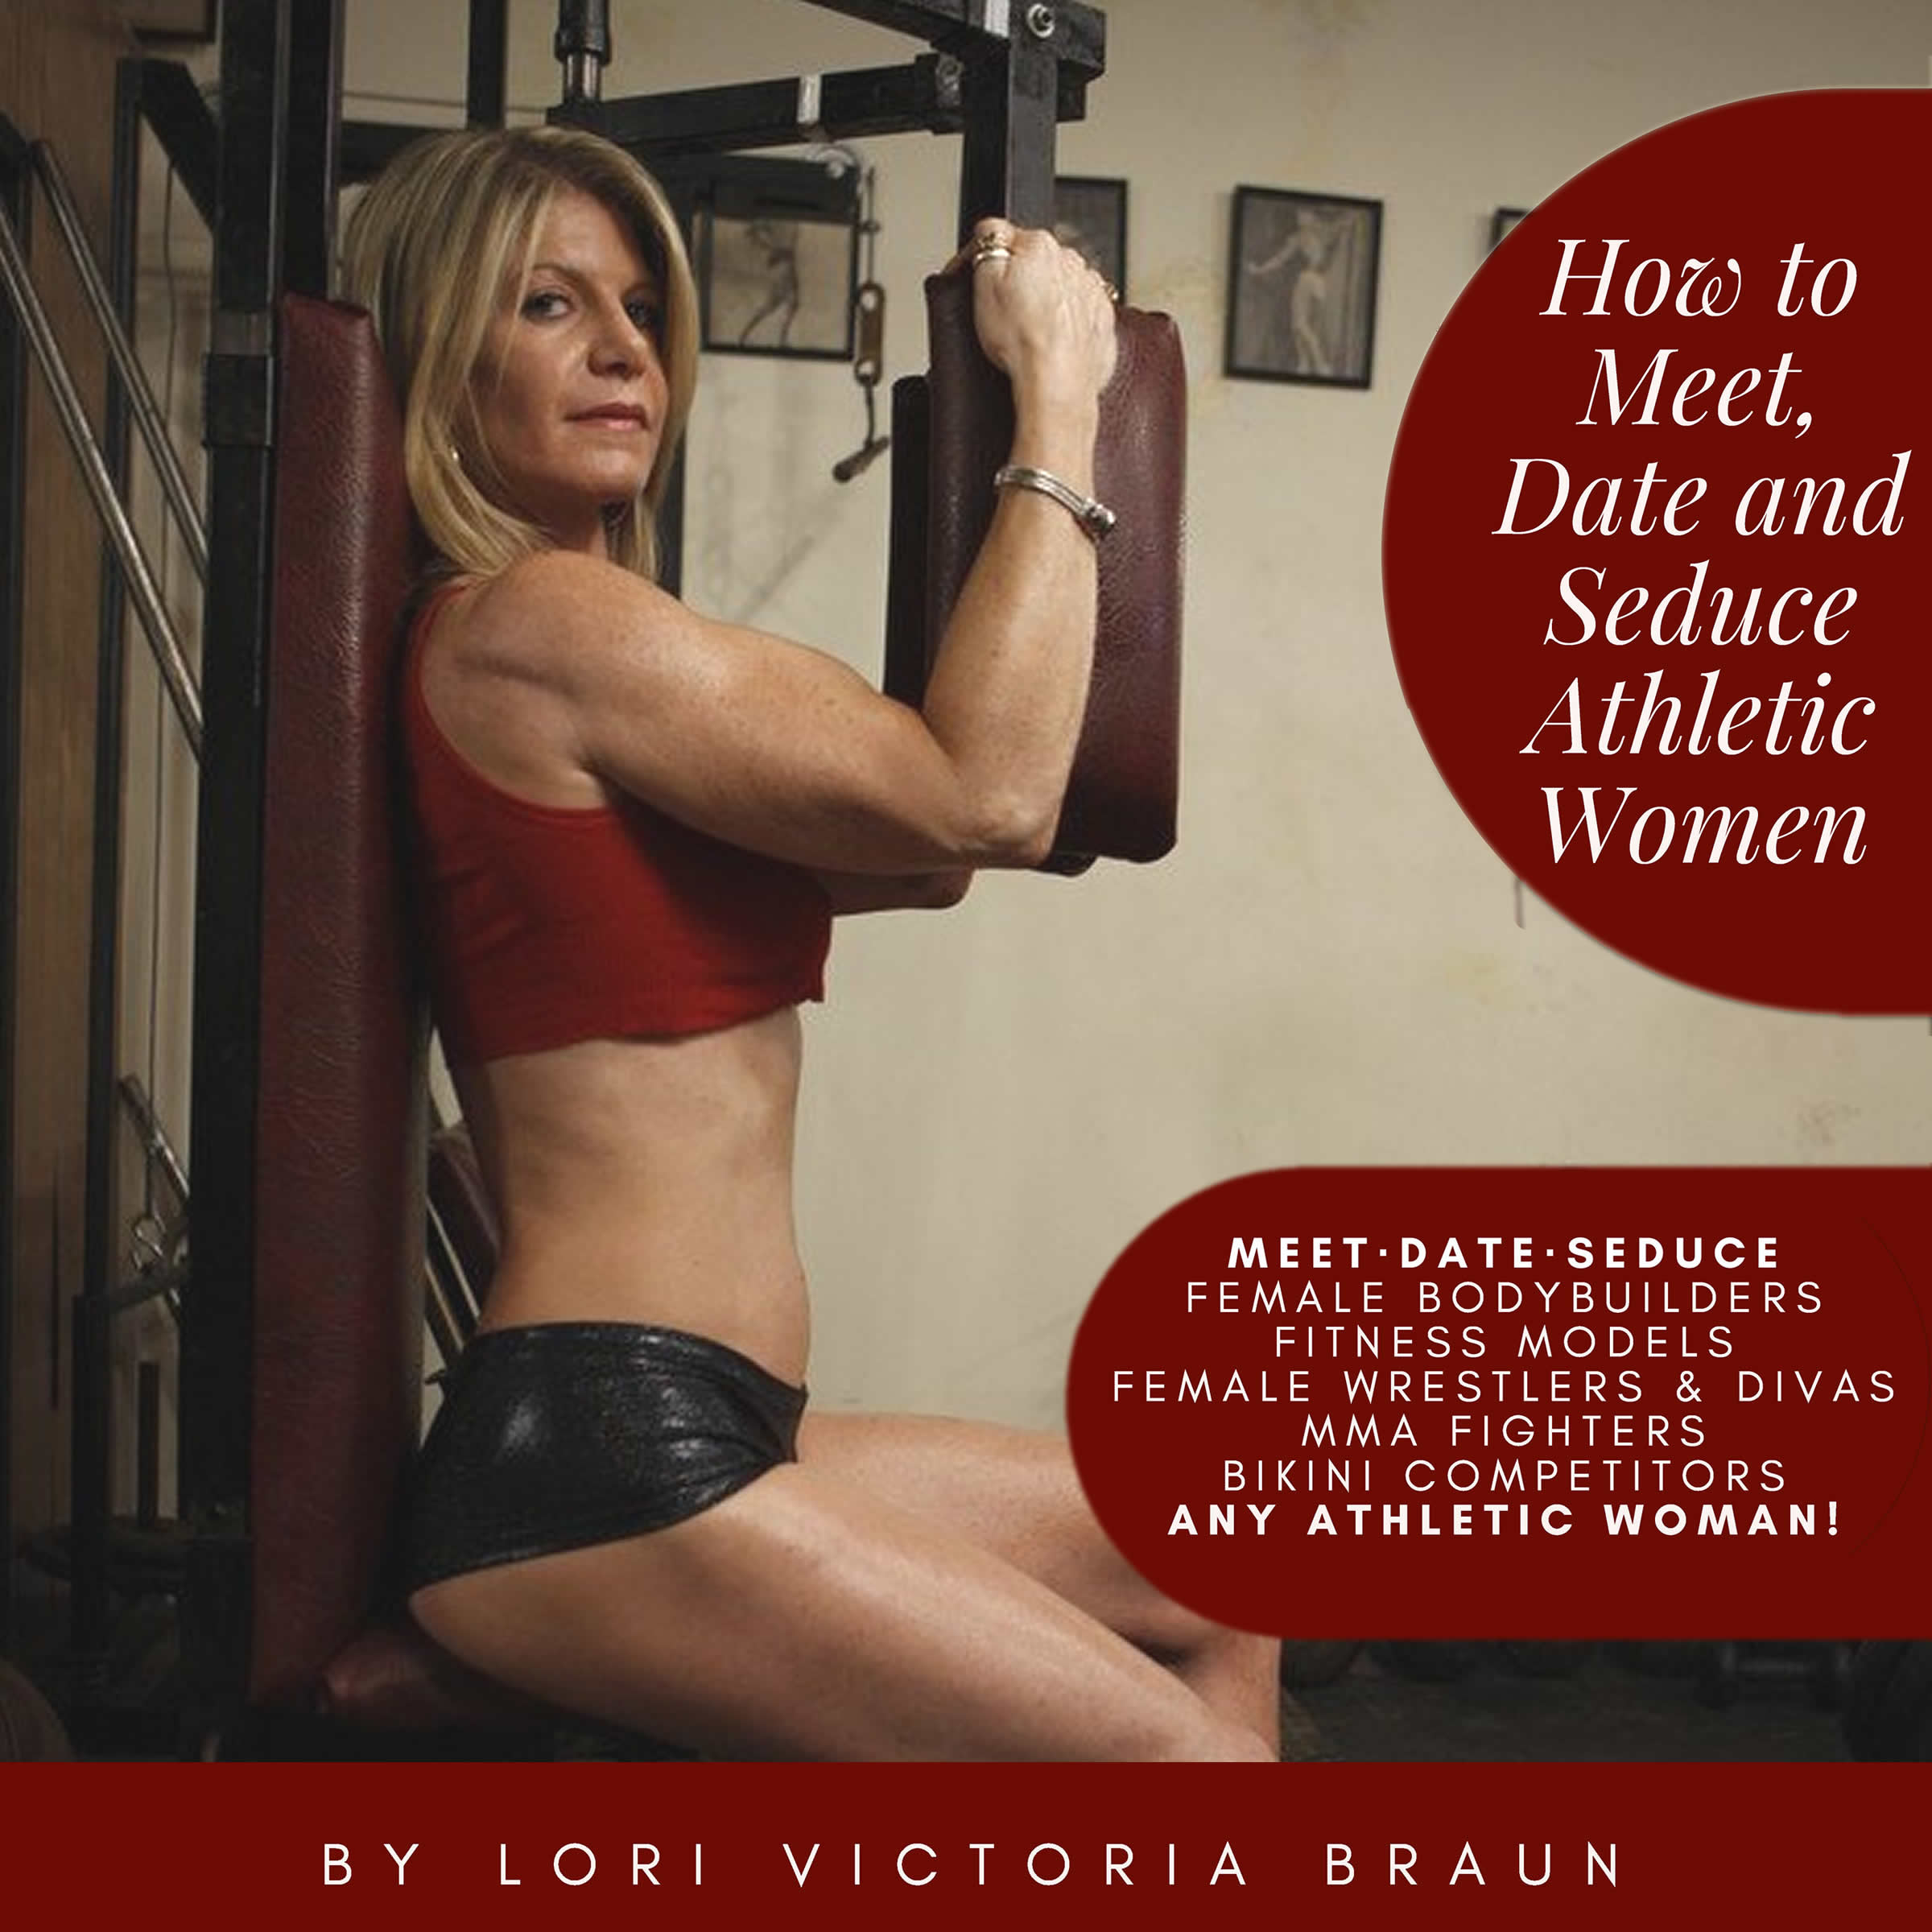 Seduce_Atlethtic_Women (2)